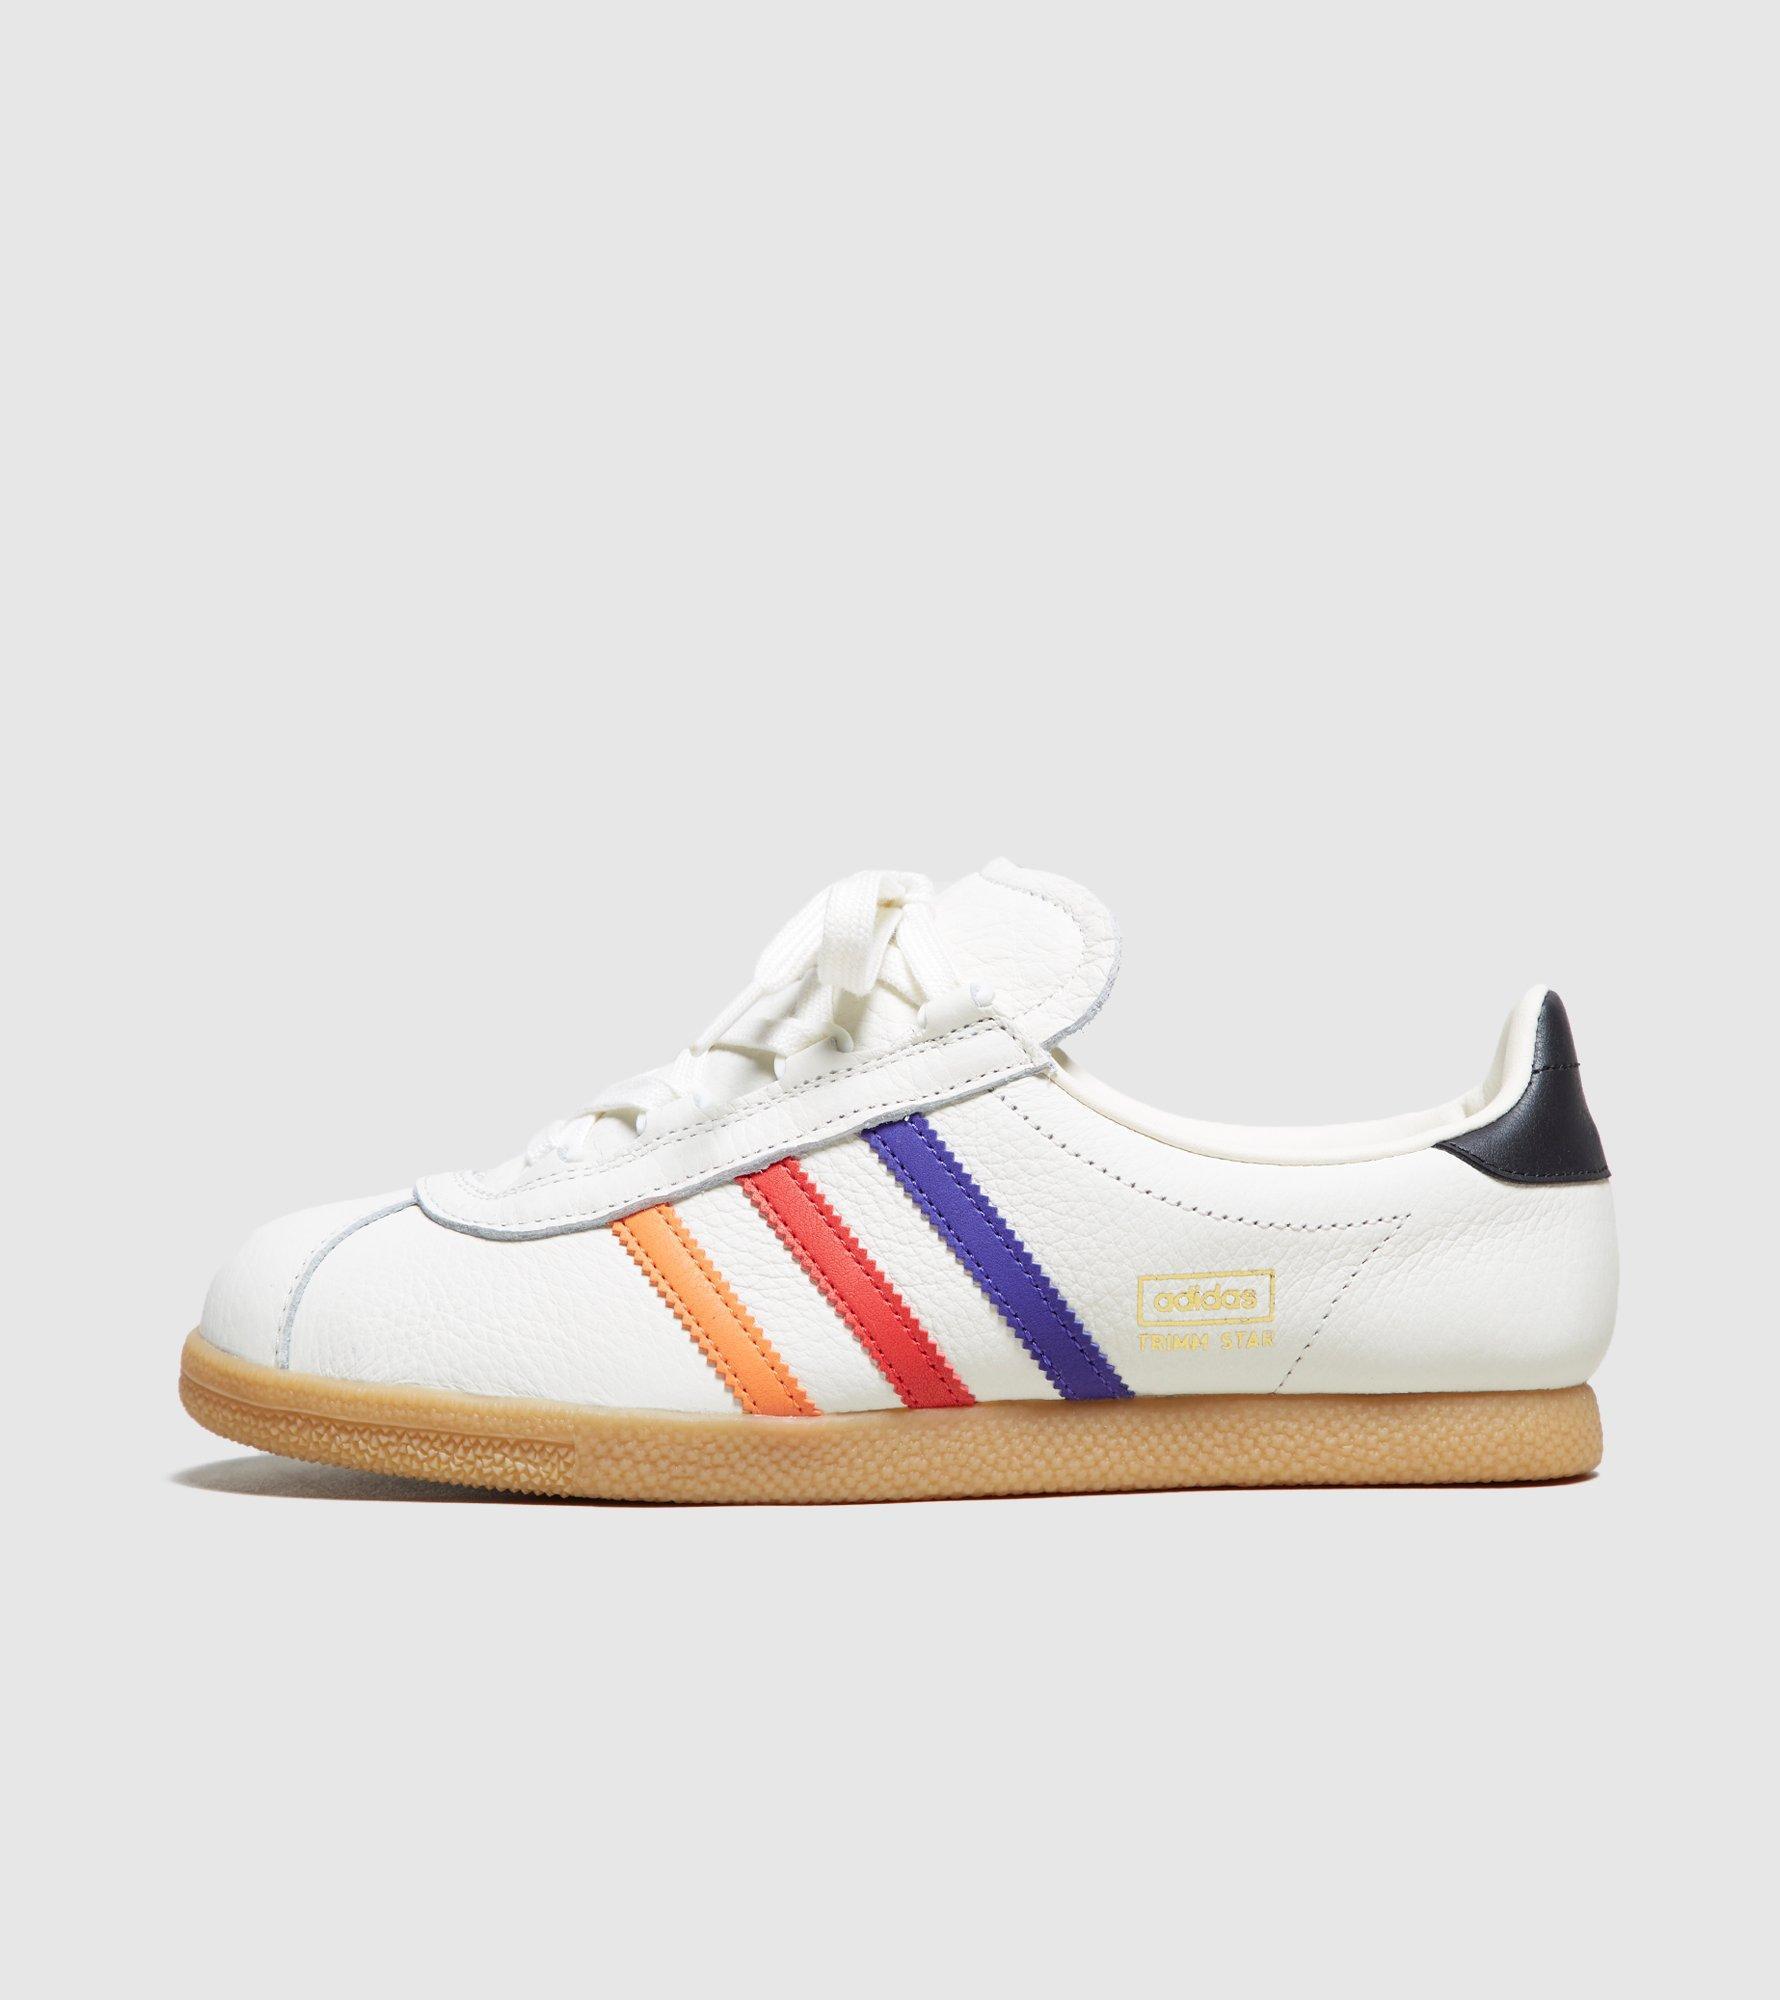 Adidas Originals White Trimm Star ?vhs? Size? Exclusive Women's